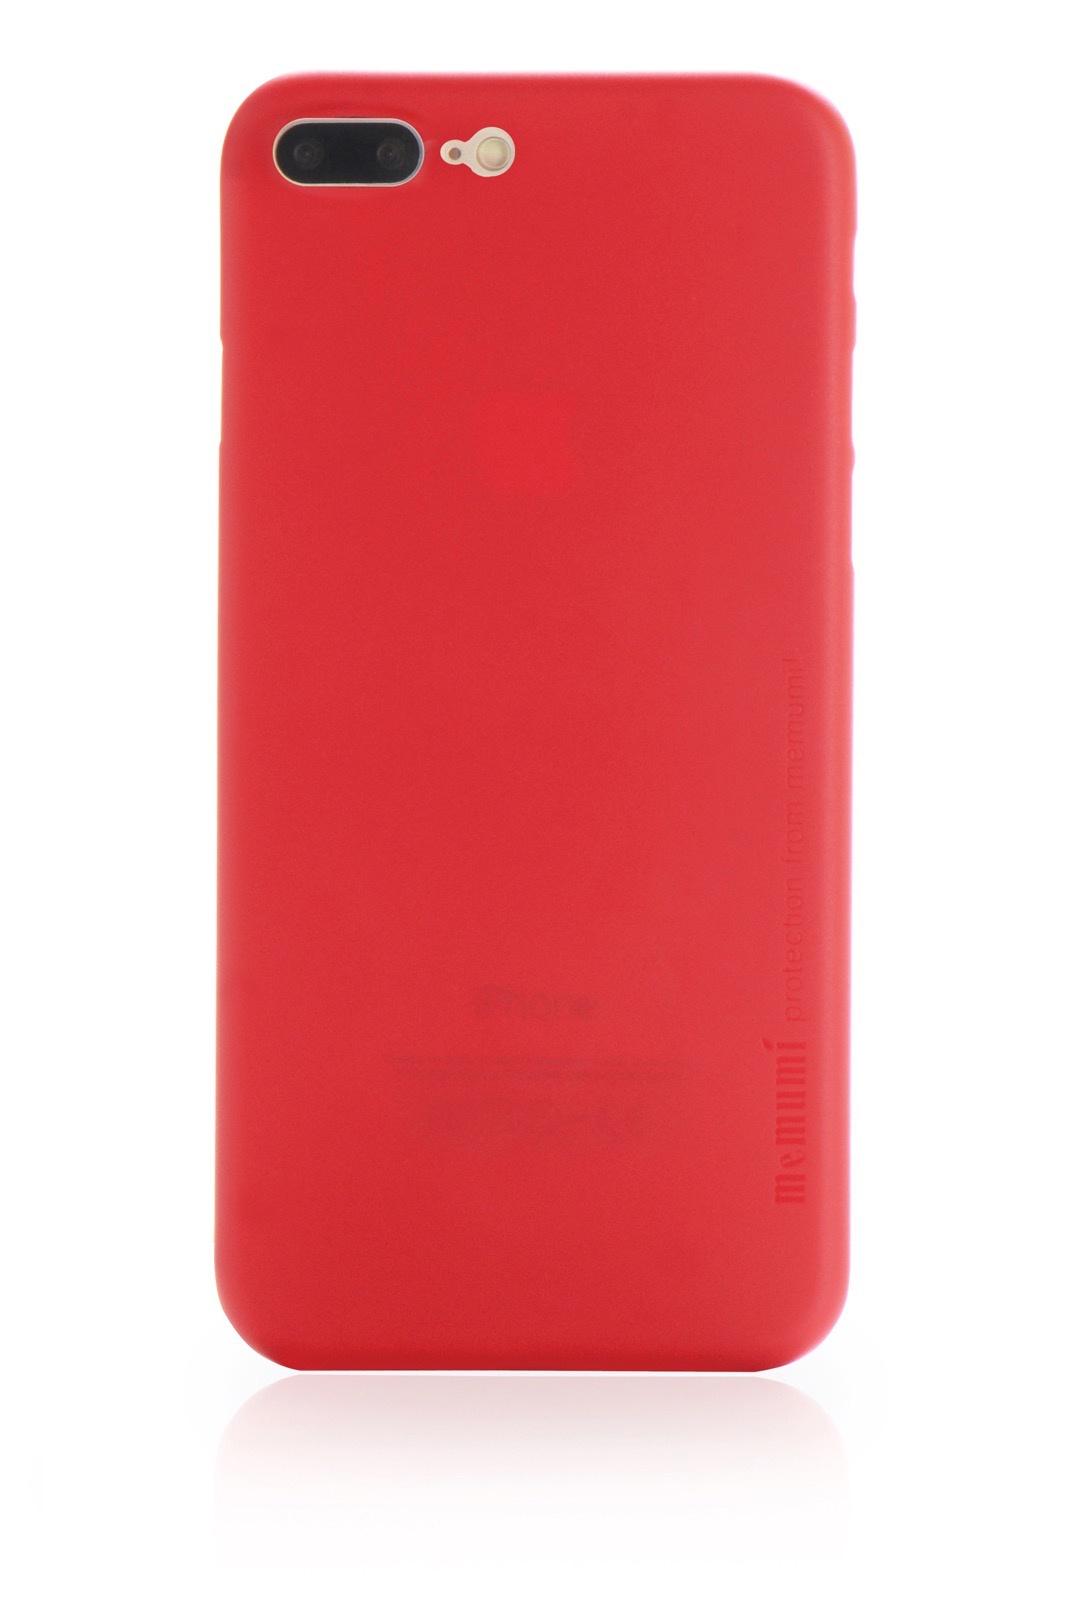 "Чехол для сотового телефона Memumi Ultra Slim Premium 905354 пластик 0.3 mm для Apple iPhone 7 Plus/8 Plus 5.5"", красный"